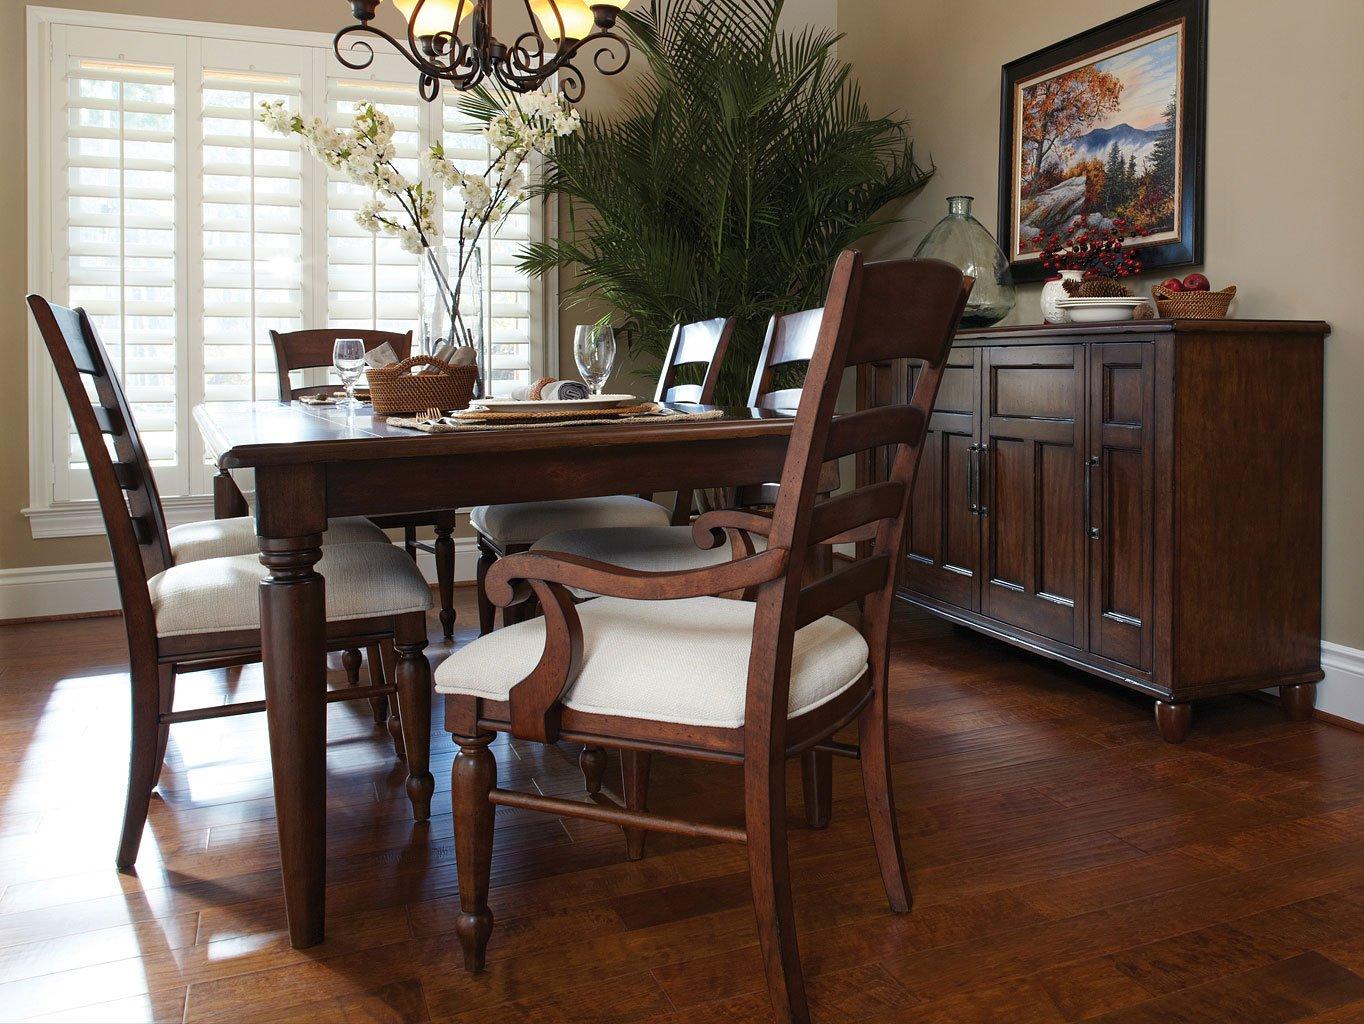 Blue Ridge Rectangular Dining Room Set W/ Ladder Chairs